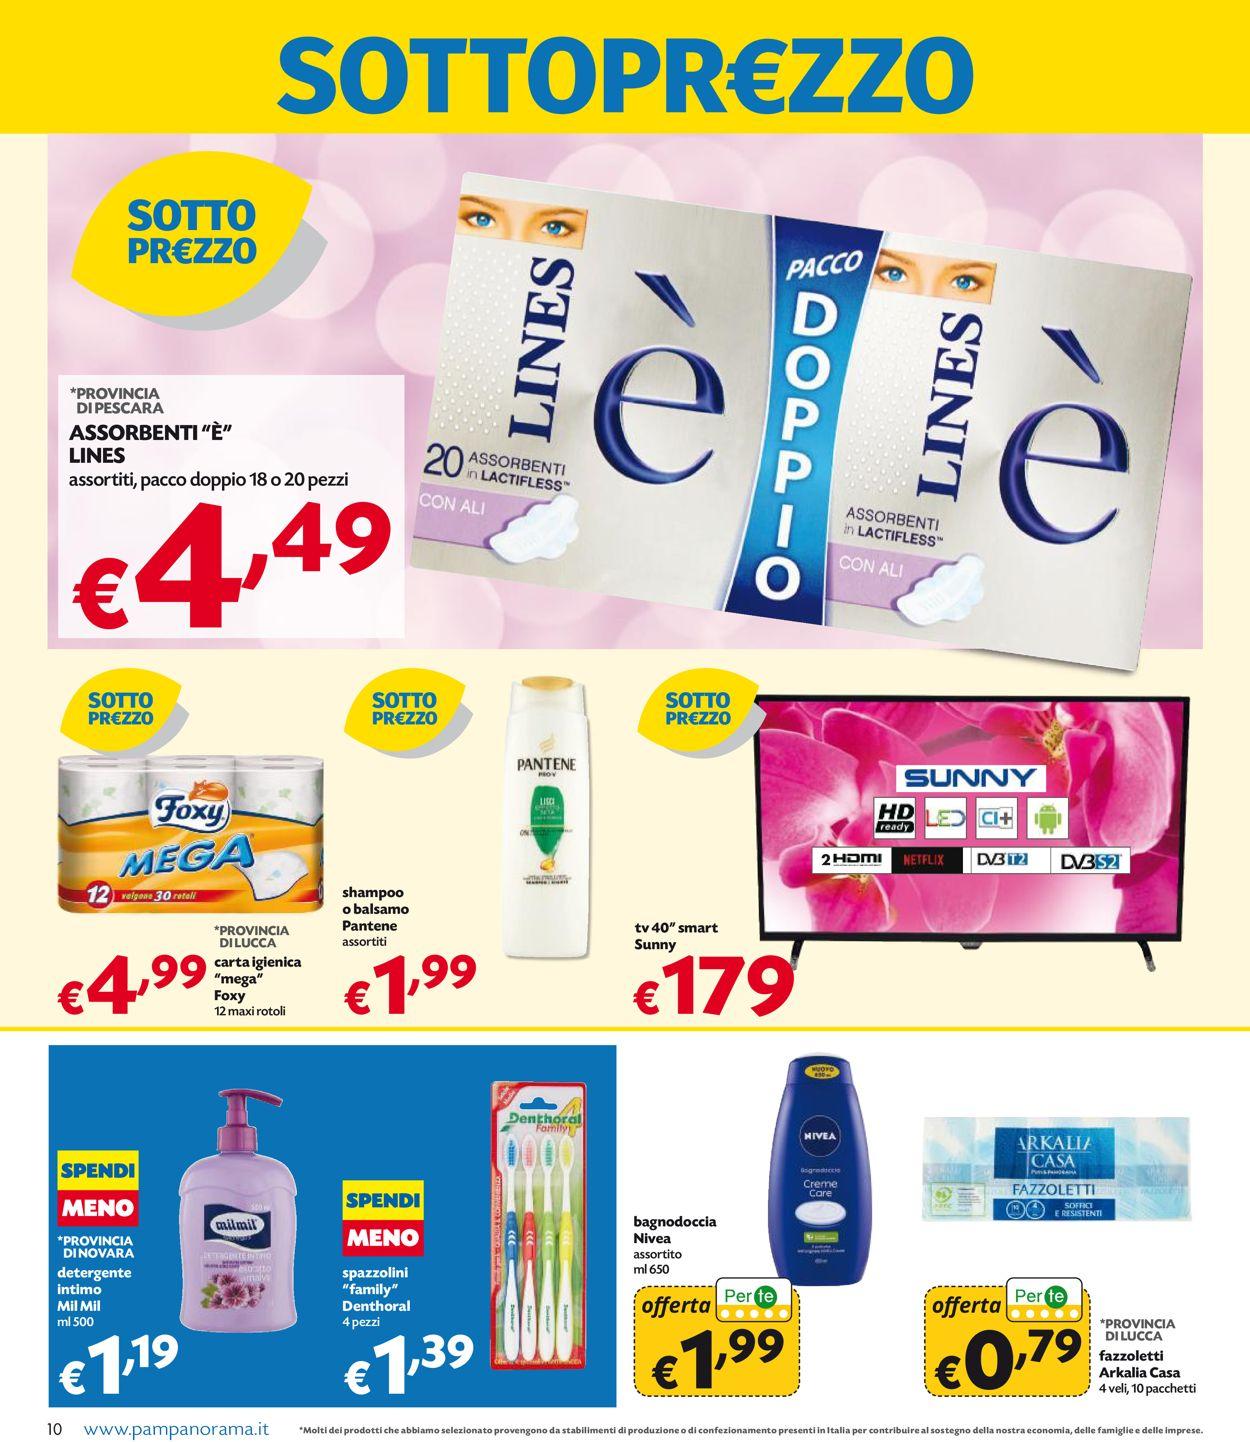 Volantino Pam Panorama - Black Friday 2020 - Offerte 26/11-06/12/2020 (Pagina 10)